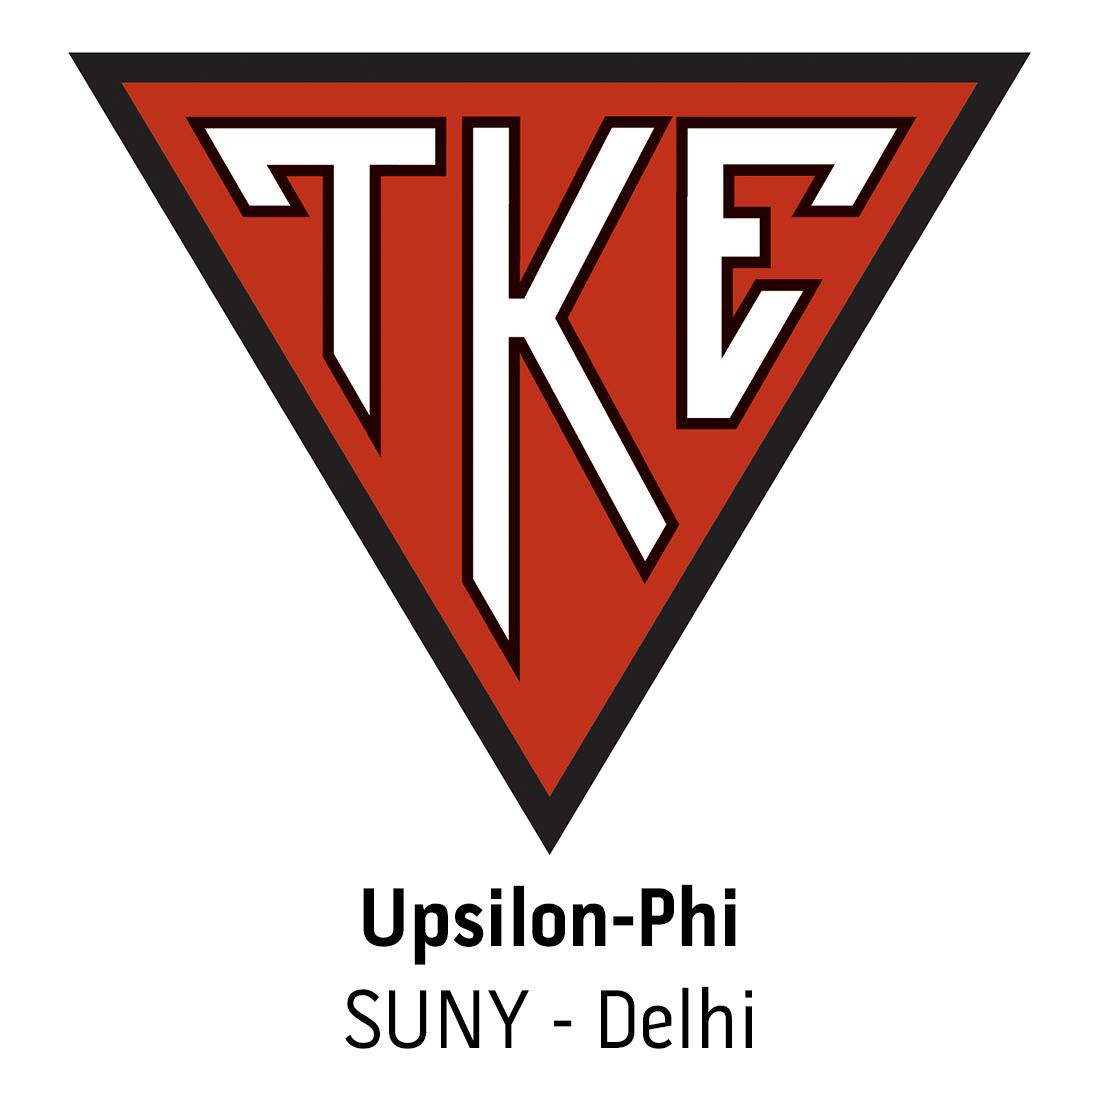 Upsilon-Phi Chapter at SUNY Delhi